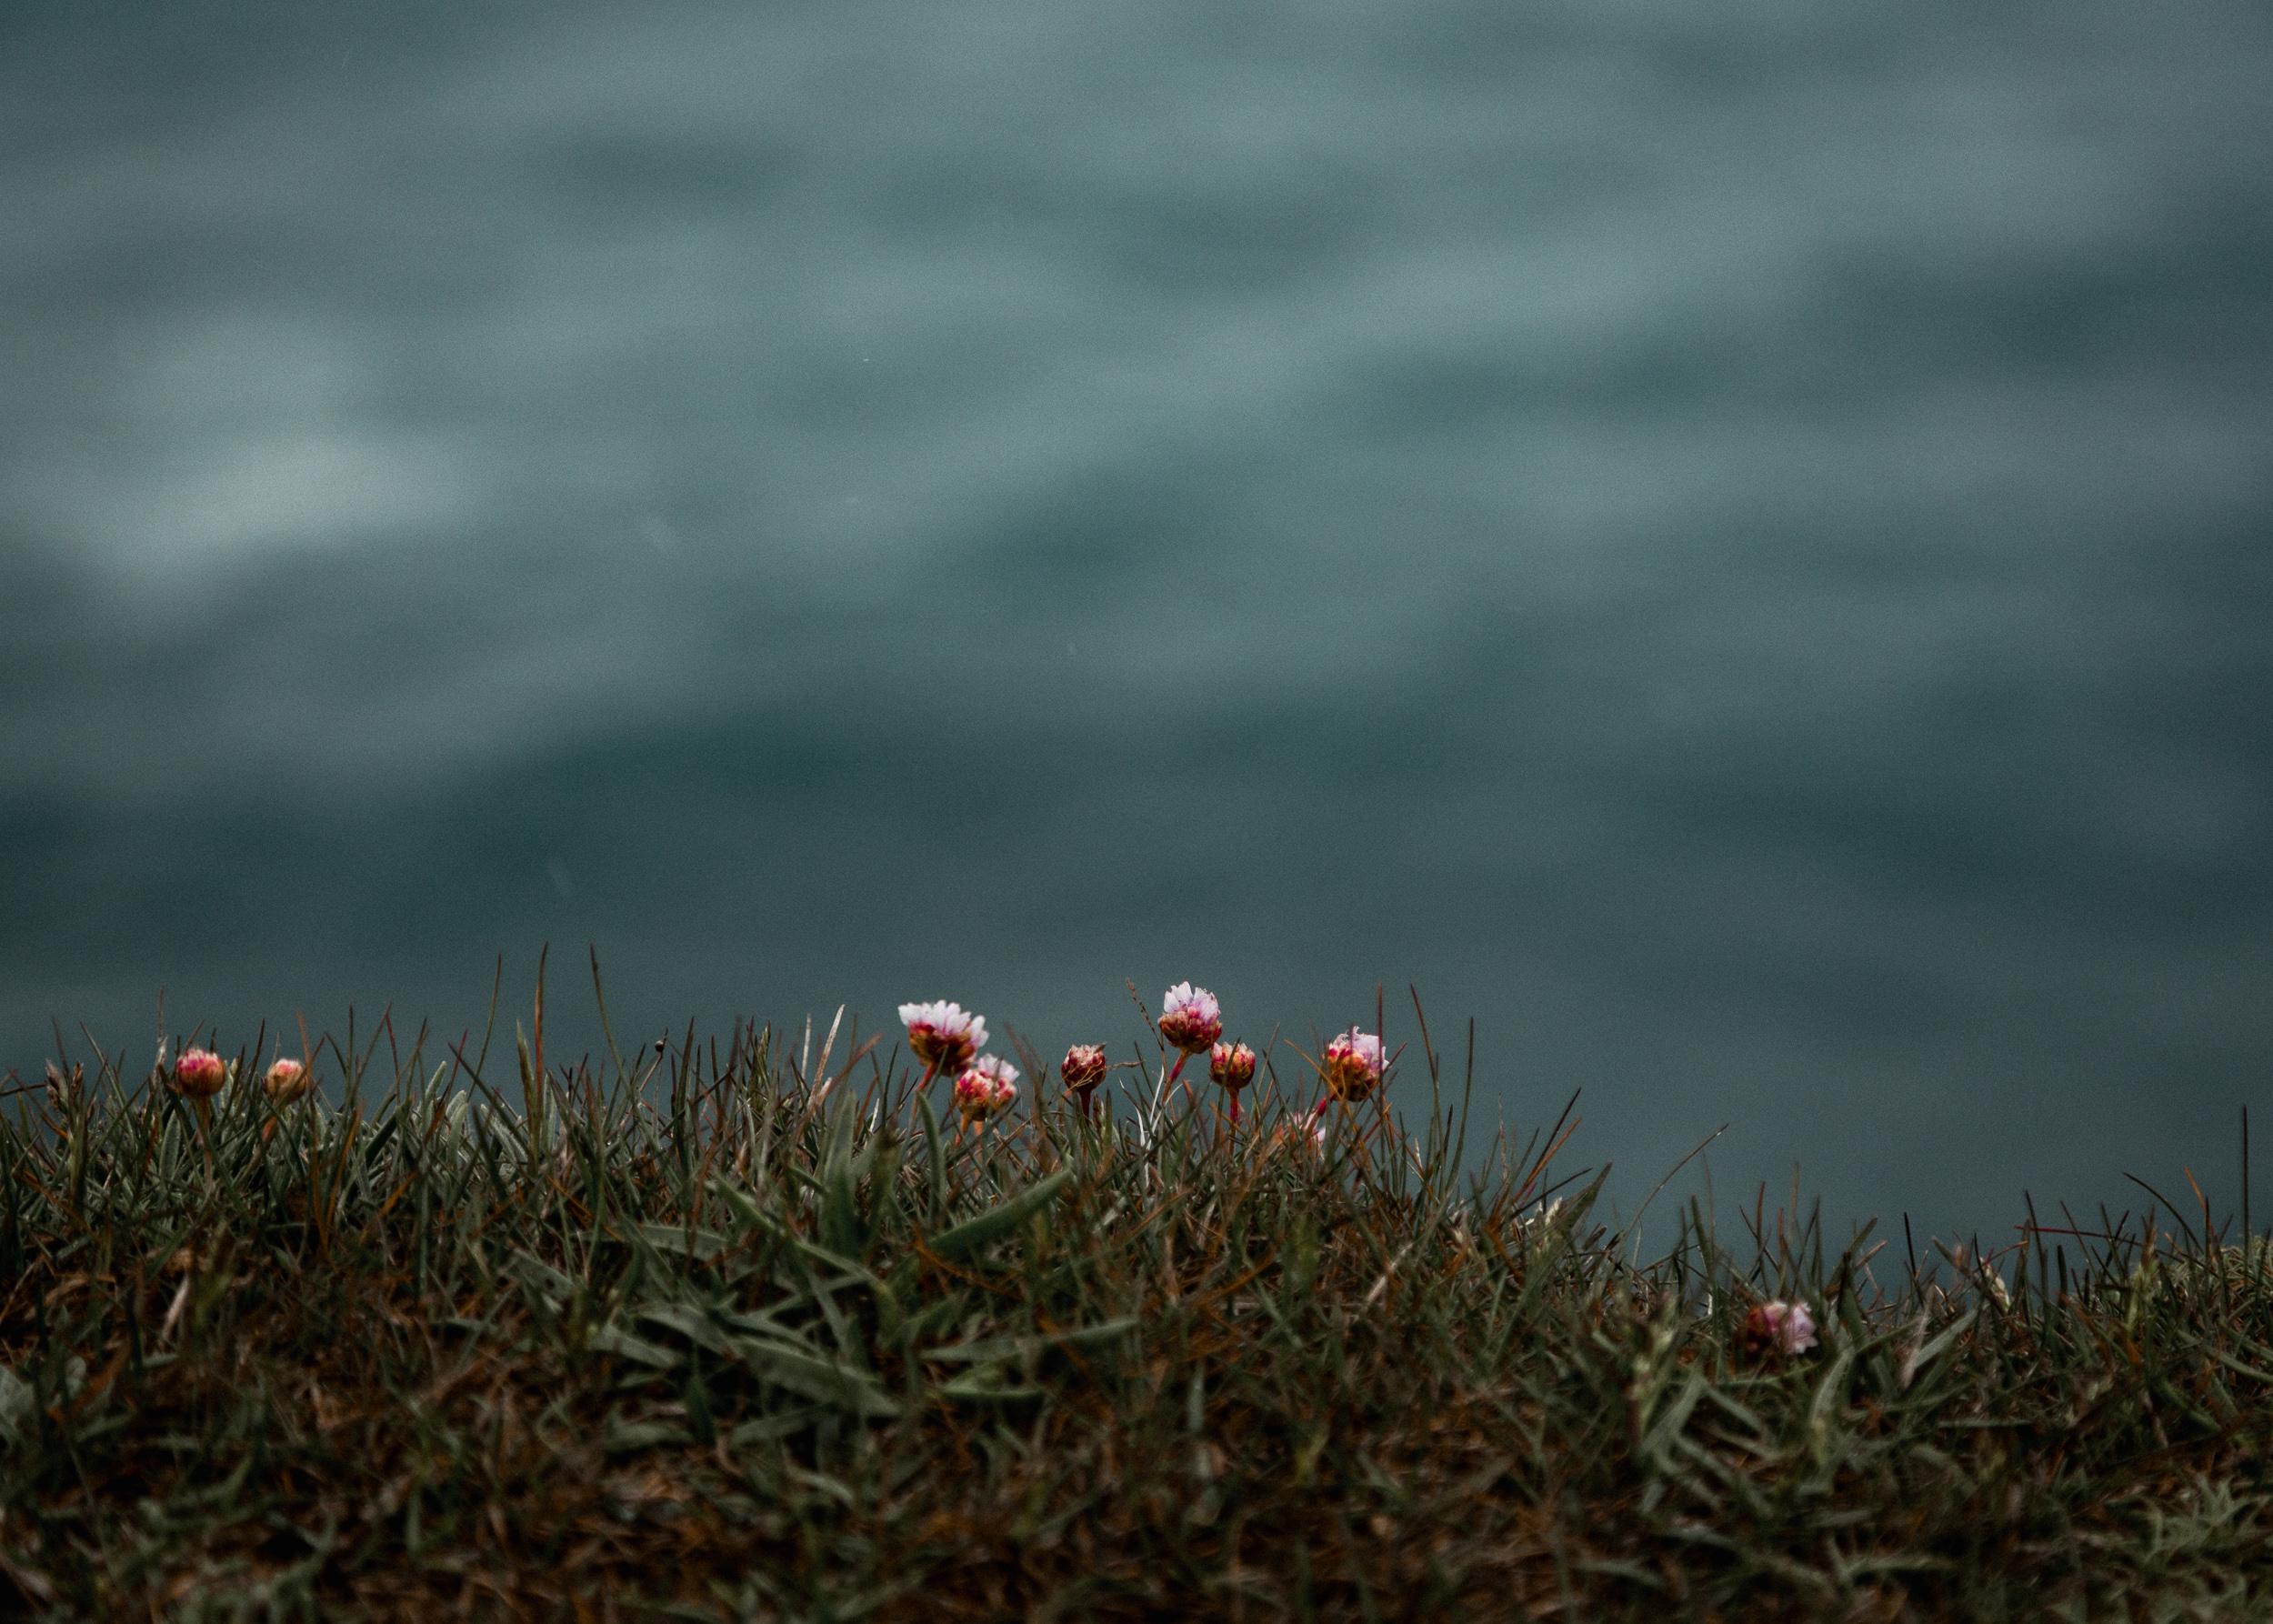 04-iceland-armeria-maritima-thrift-flower-anna-elina-lahti-photographer.jpg